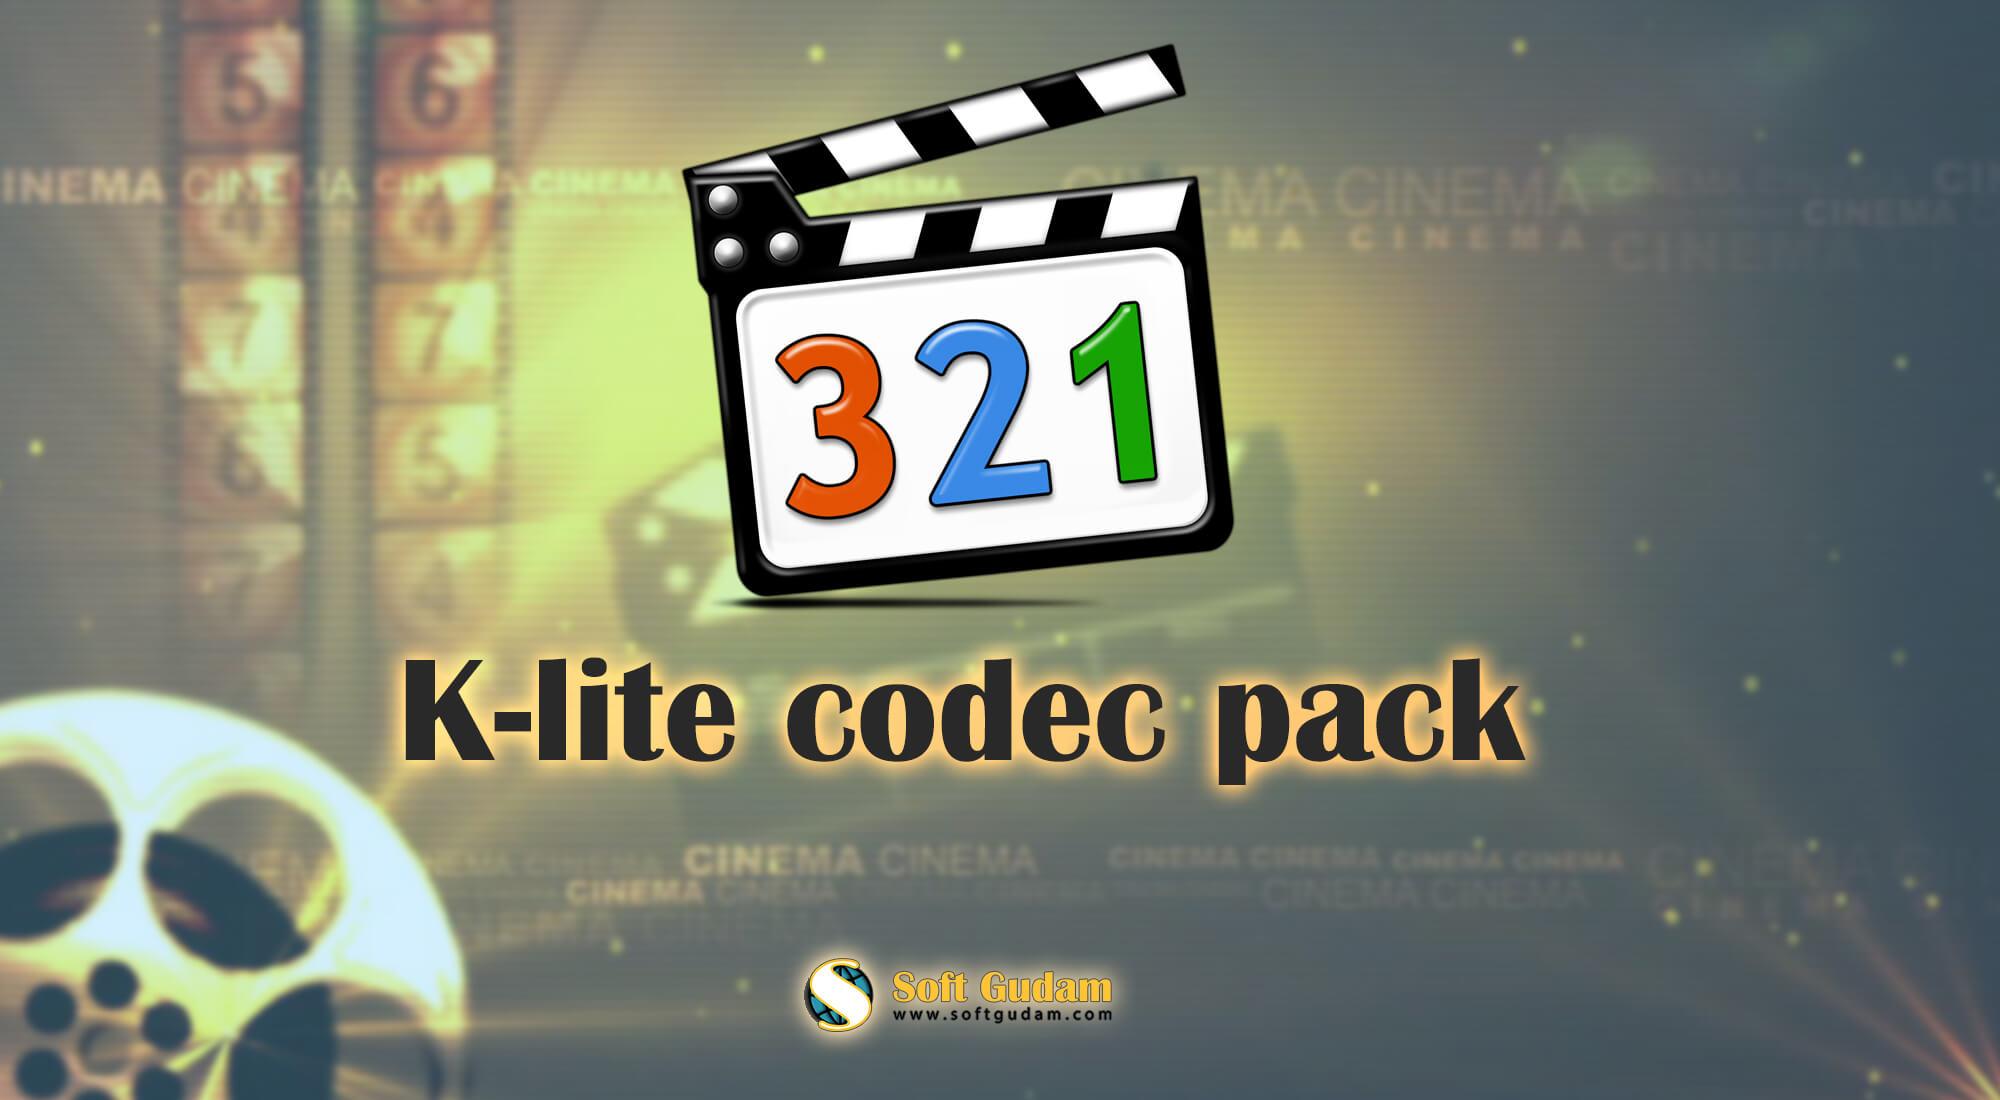 k-lite codec pack download